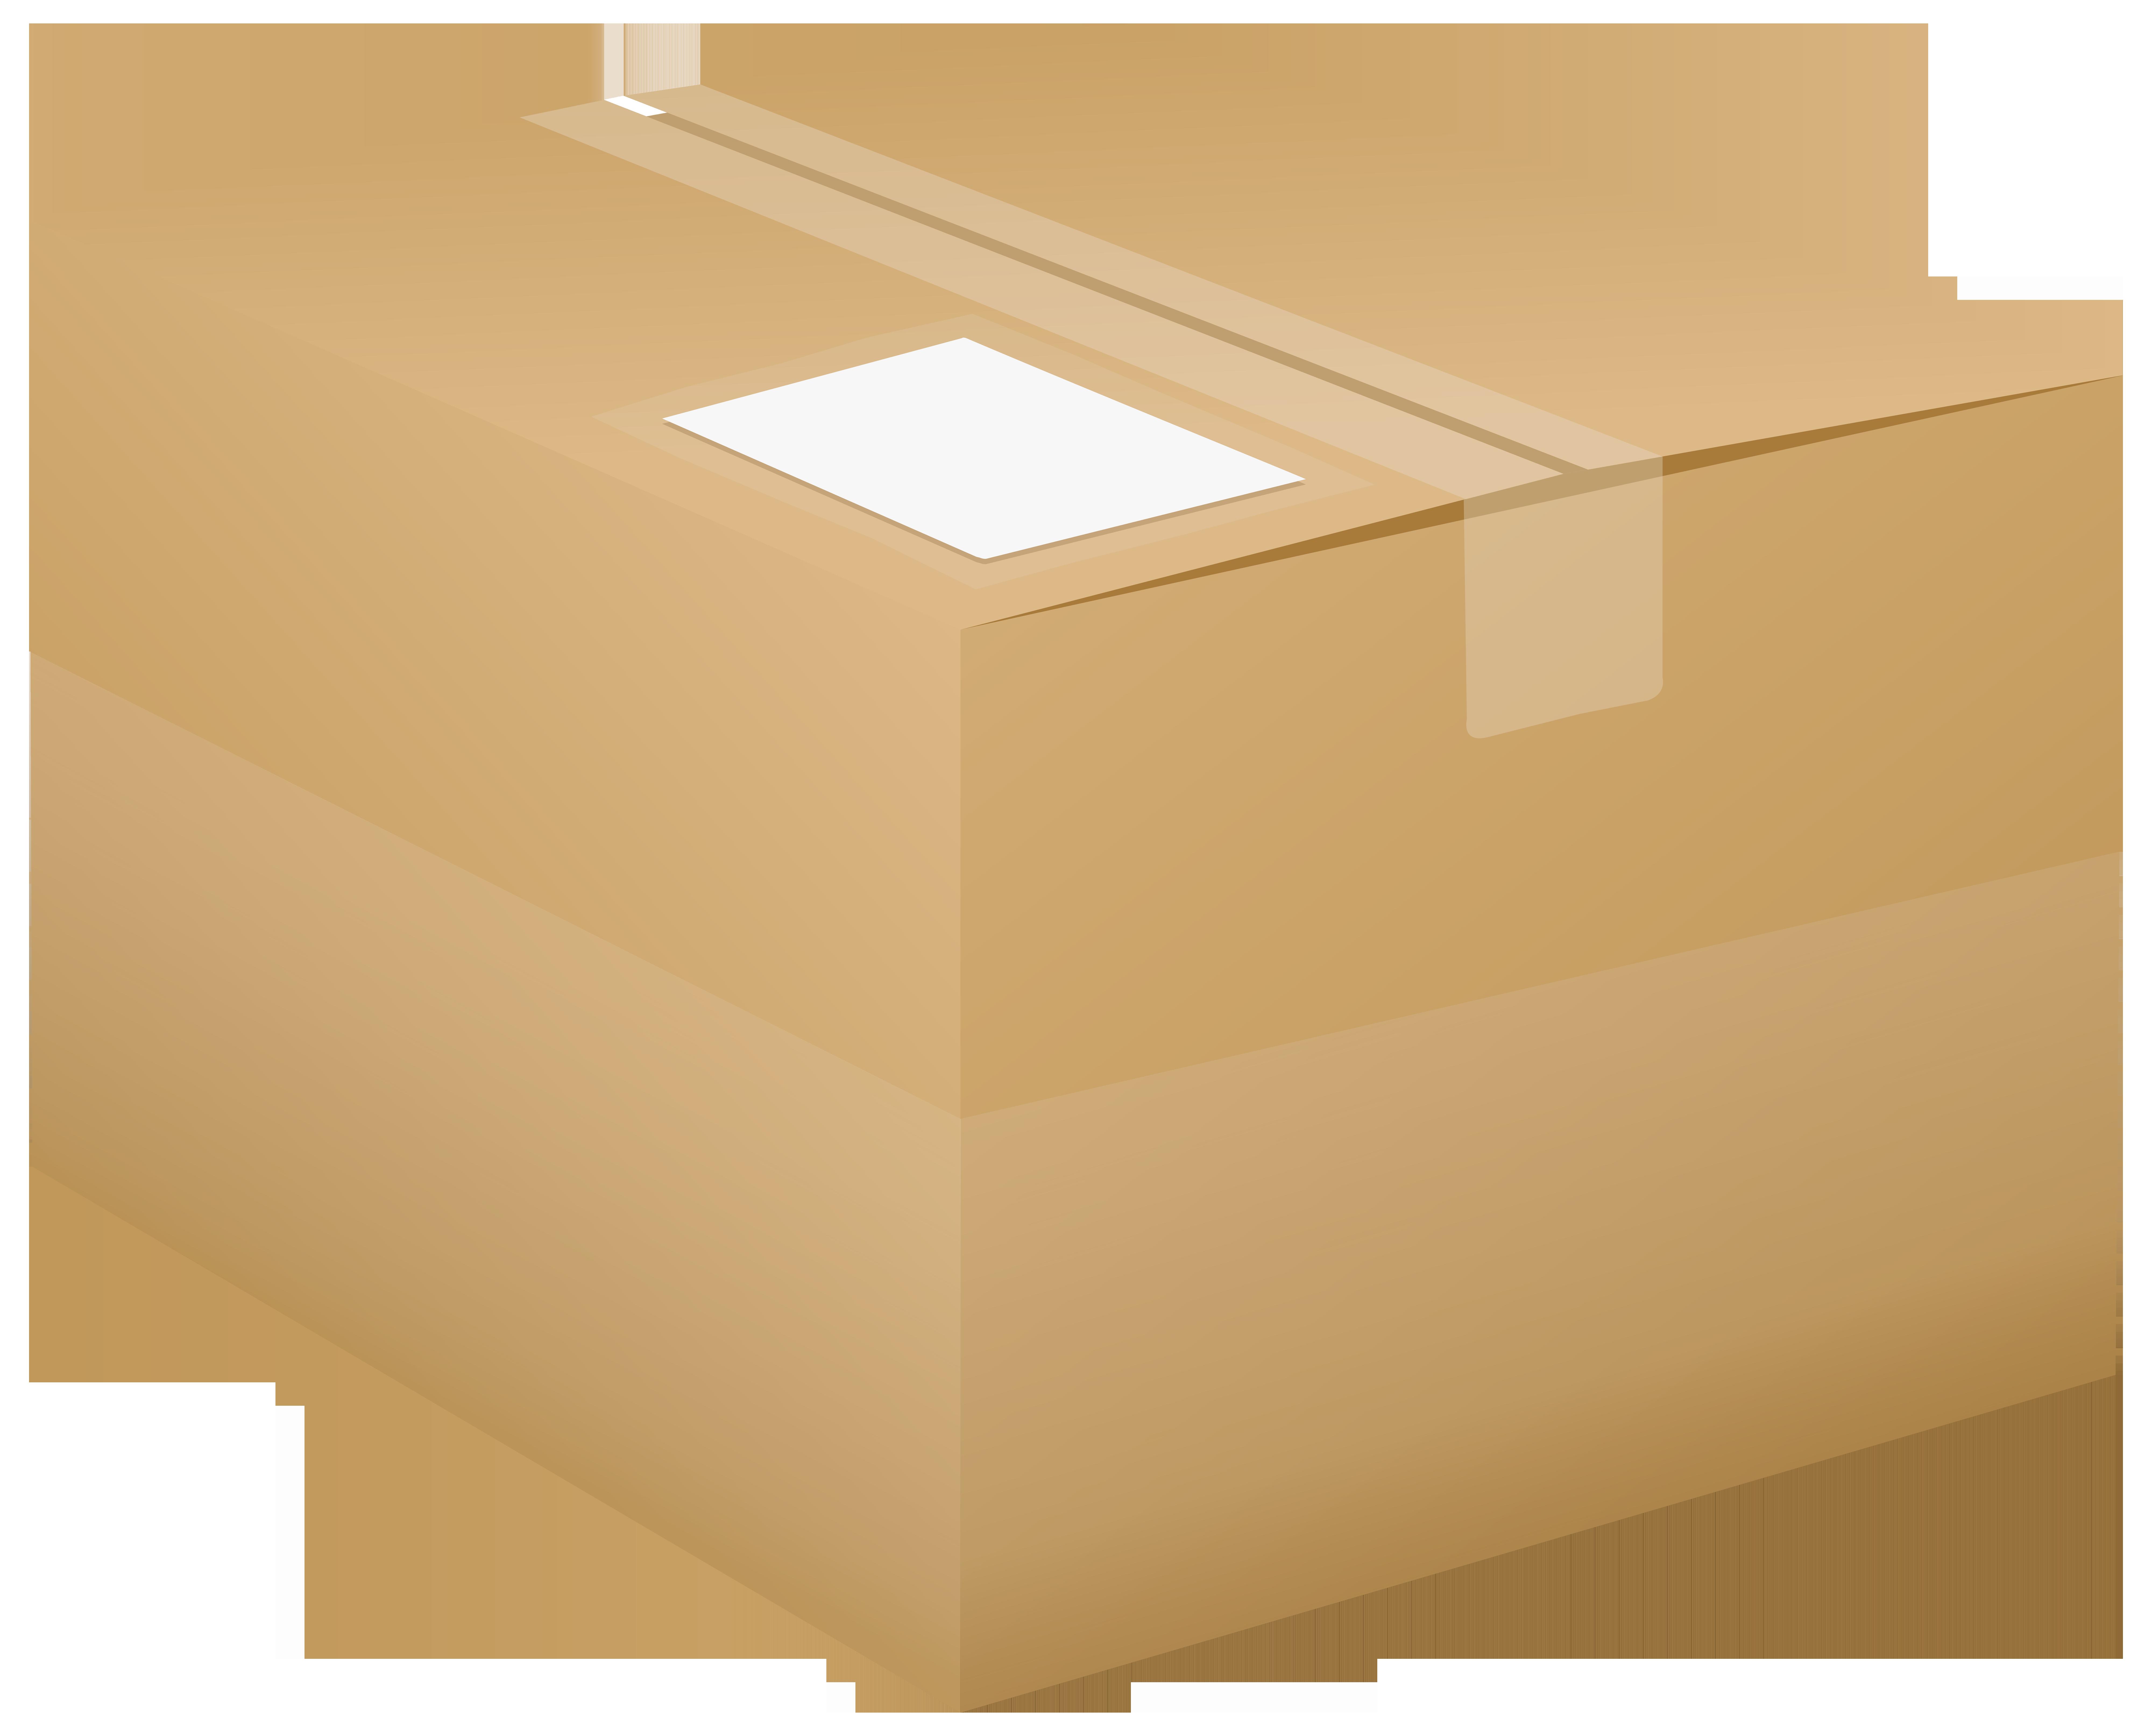 Png clip art image. Box clipart cardboard box